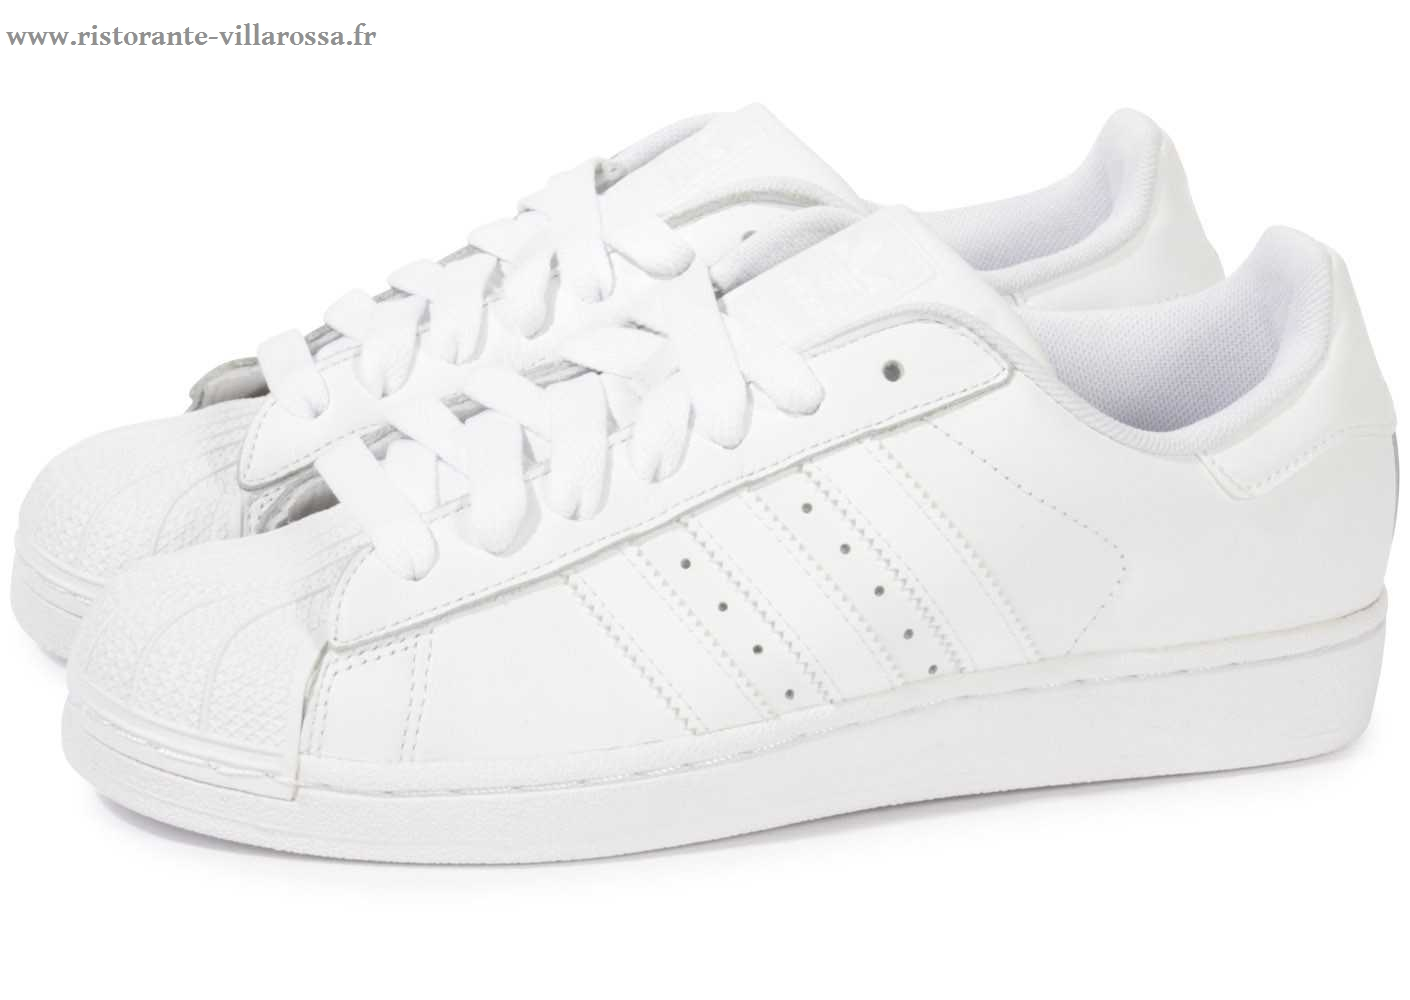 1591ca79b51 Meilleures marques à bas prix adidas superstar blanche solde Cuir ...